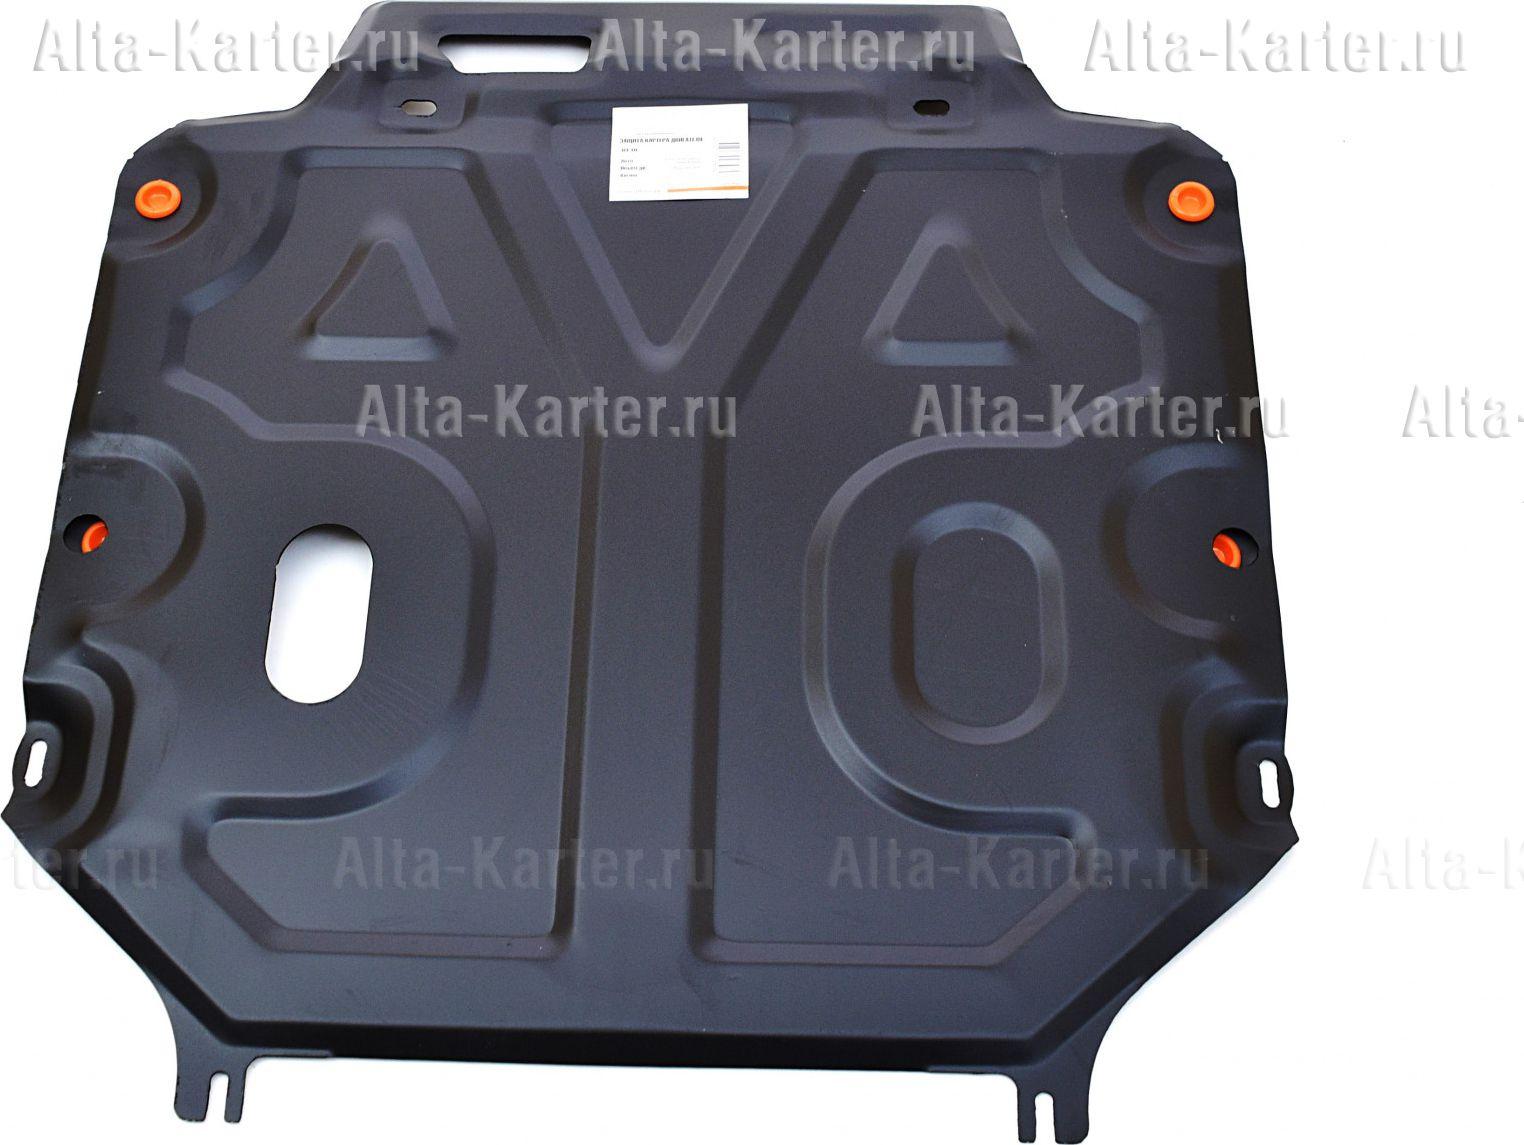 Защита Alfeco для картера и КПП Chevrolet Captiva 2013-2016. Артикул ALF.03.16 st